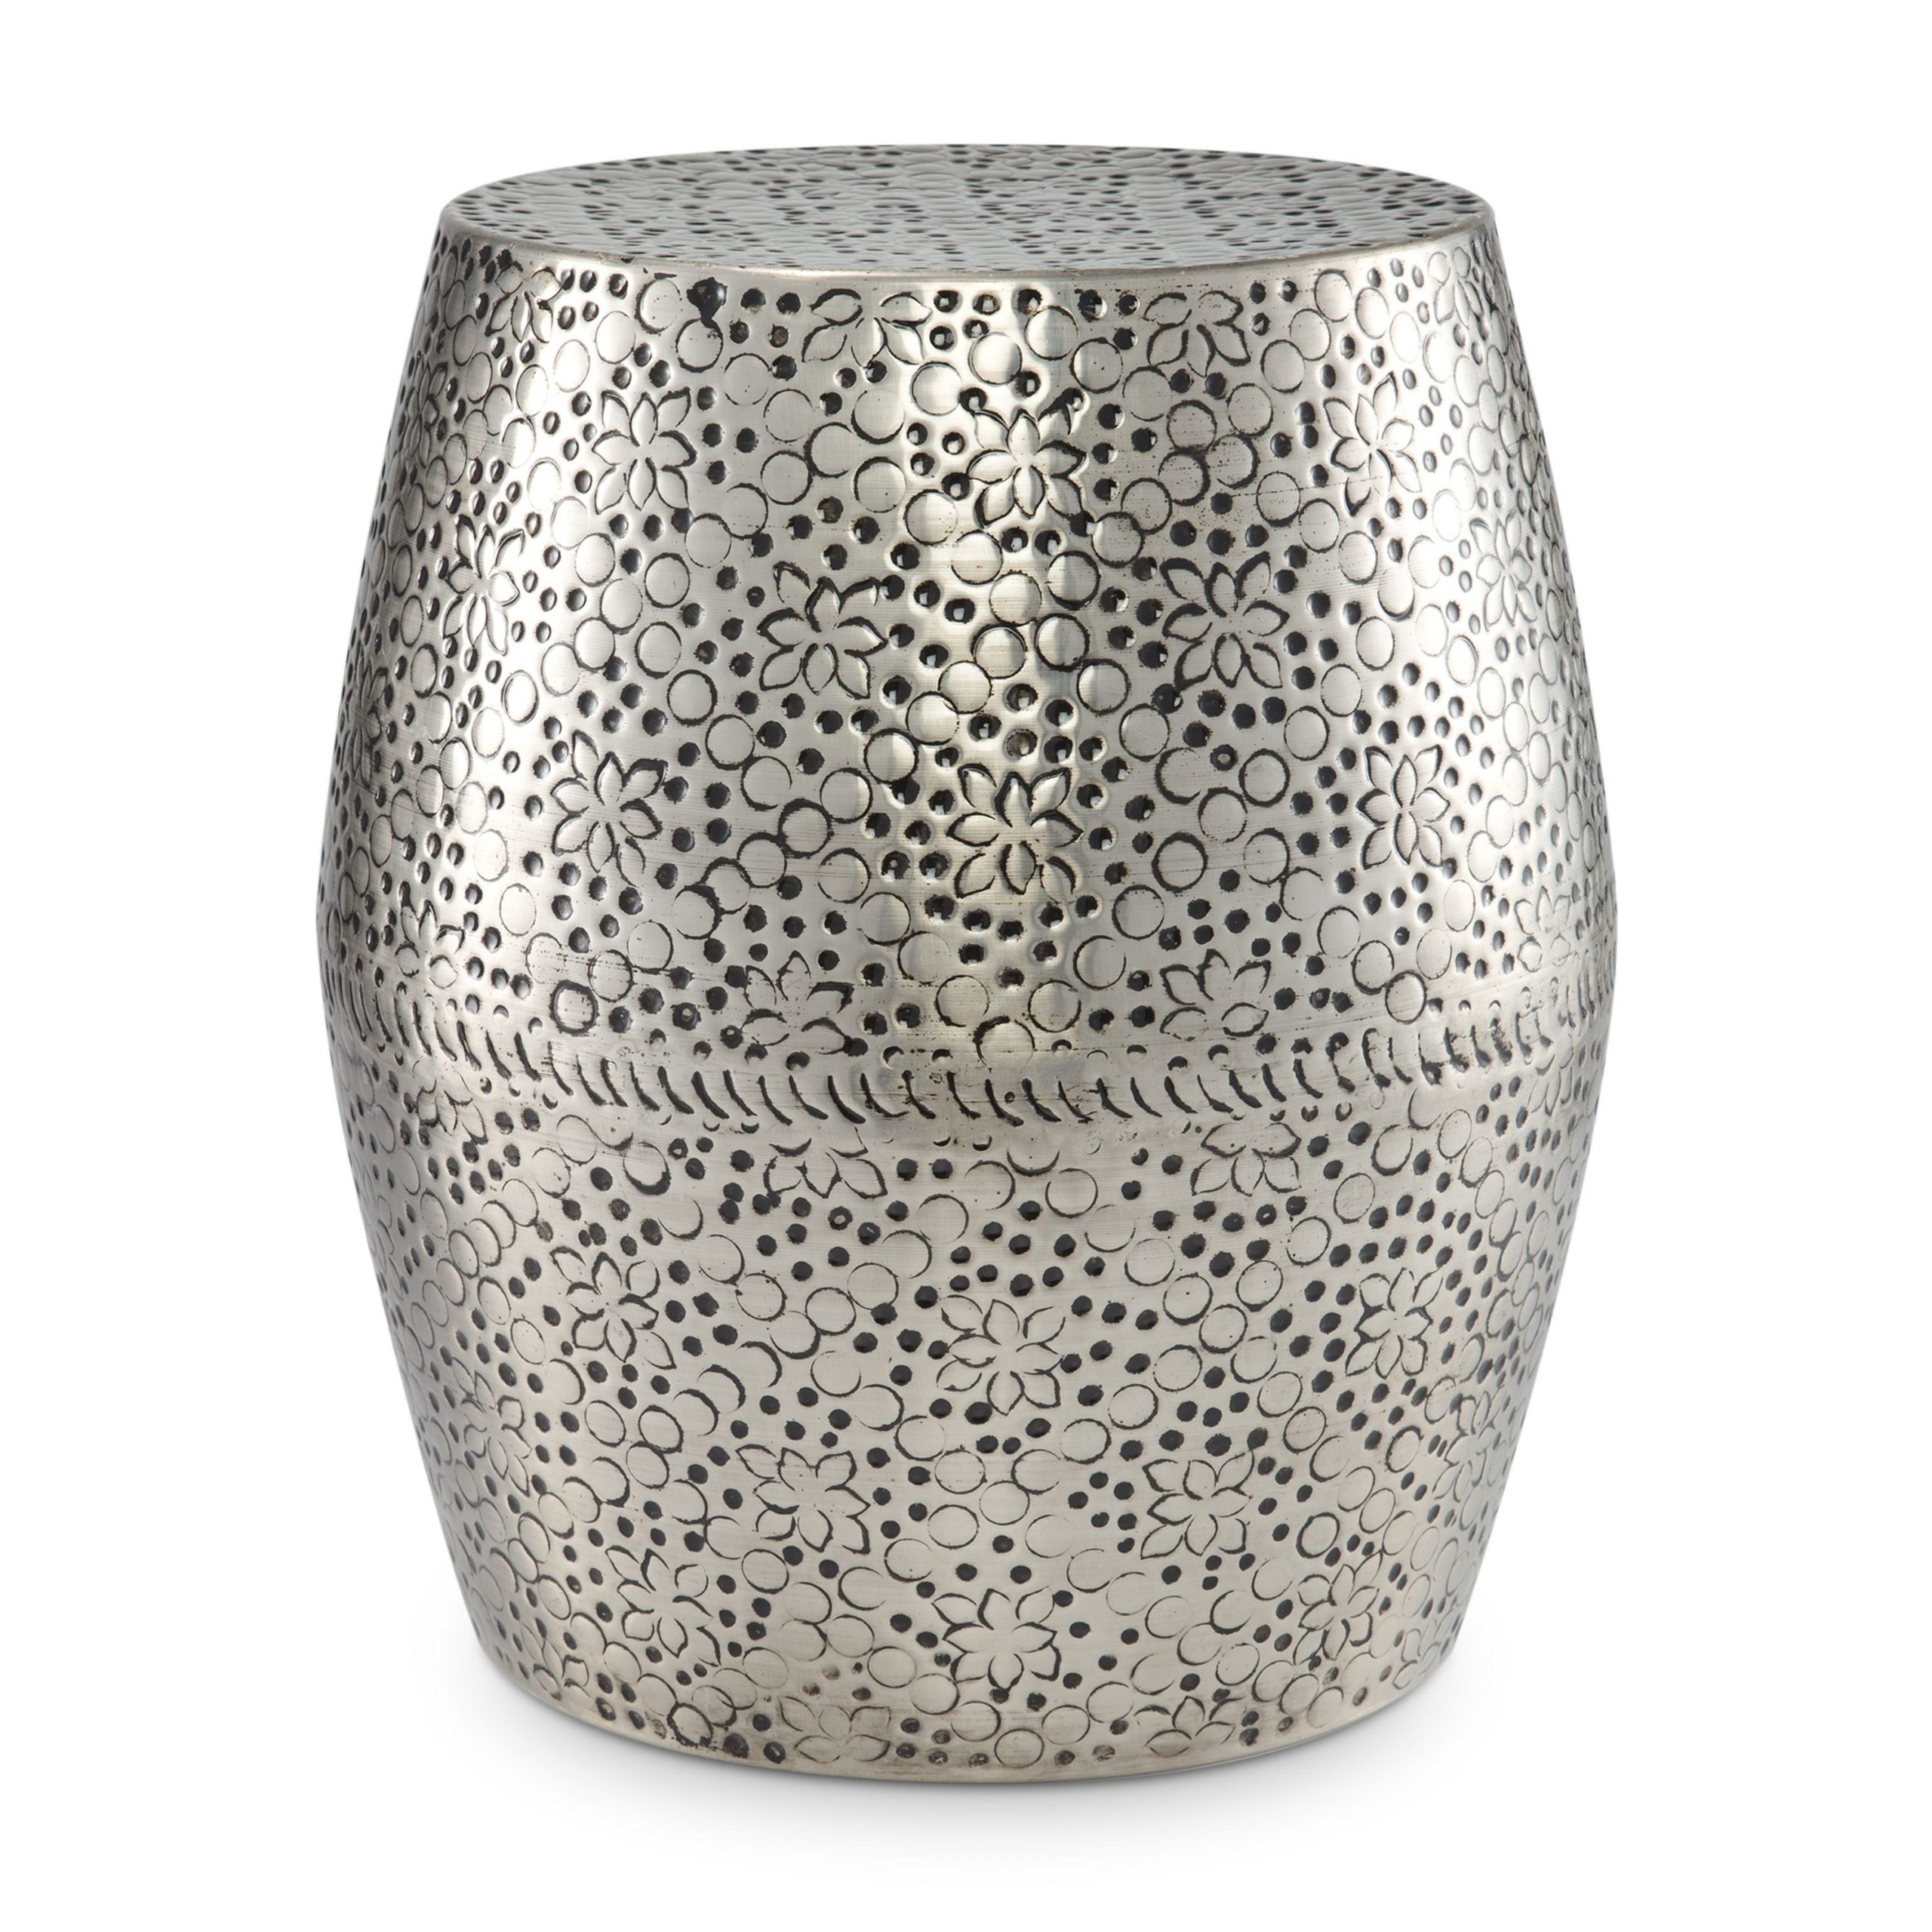 Modrn Glam Round Faux Marble Outdoor Garden Stool – Walmart In Carmon Ceramic Garden Tool (View 13 of 25)